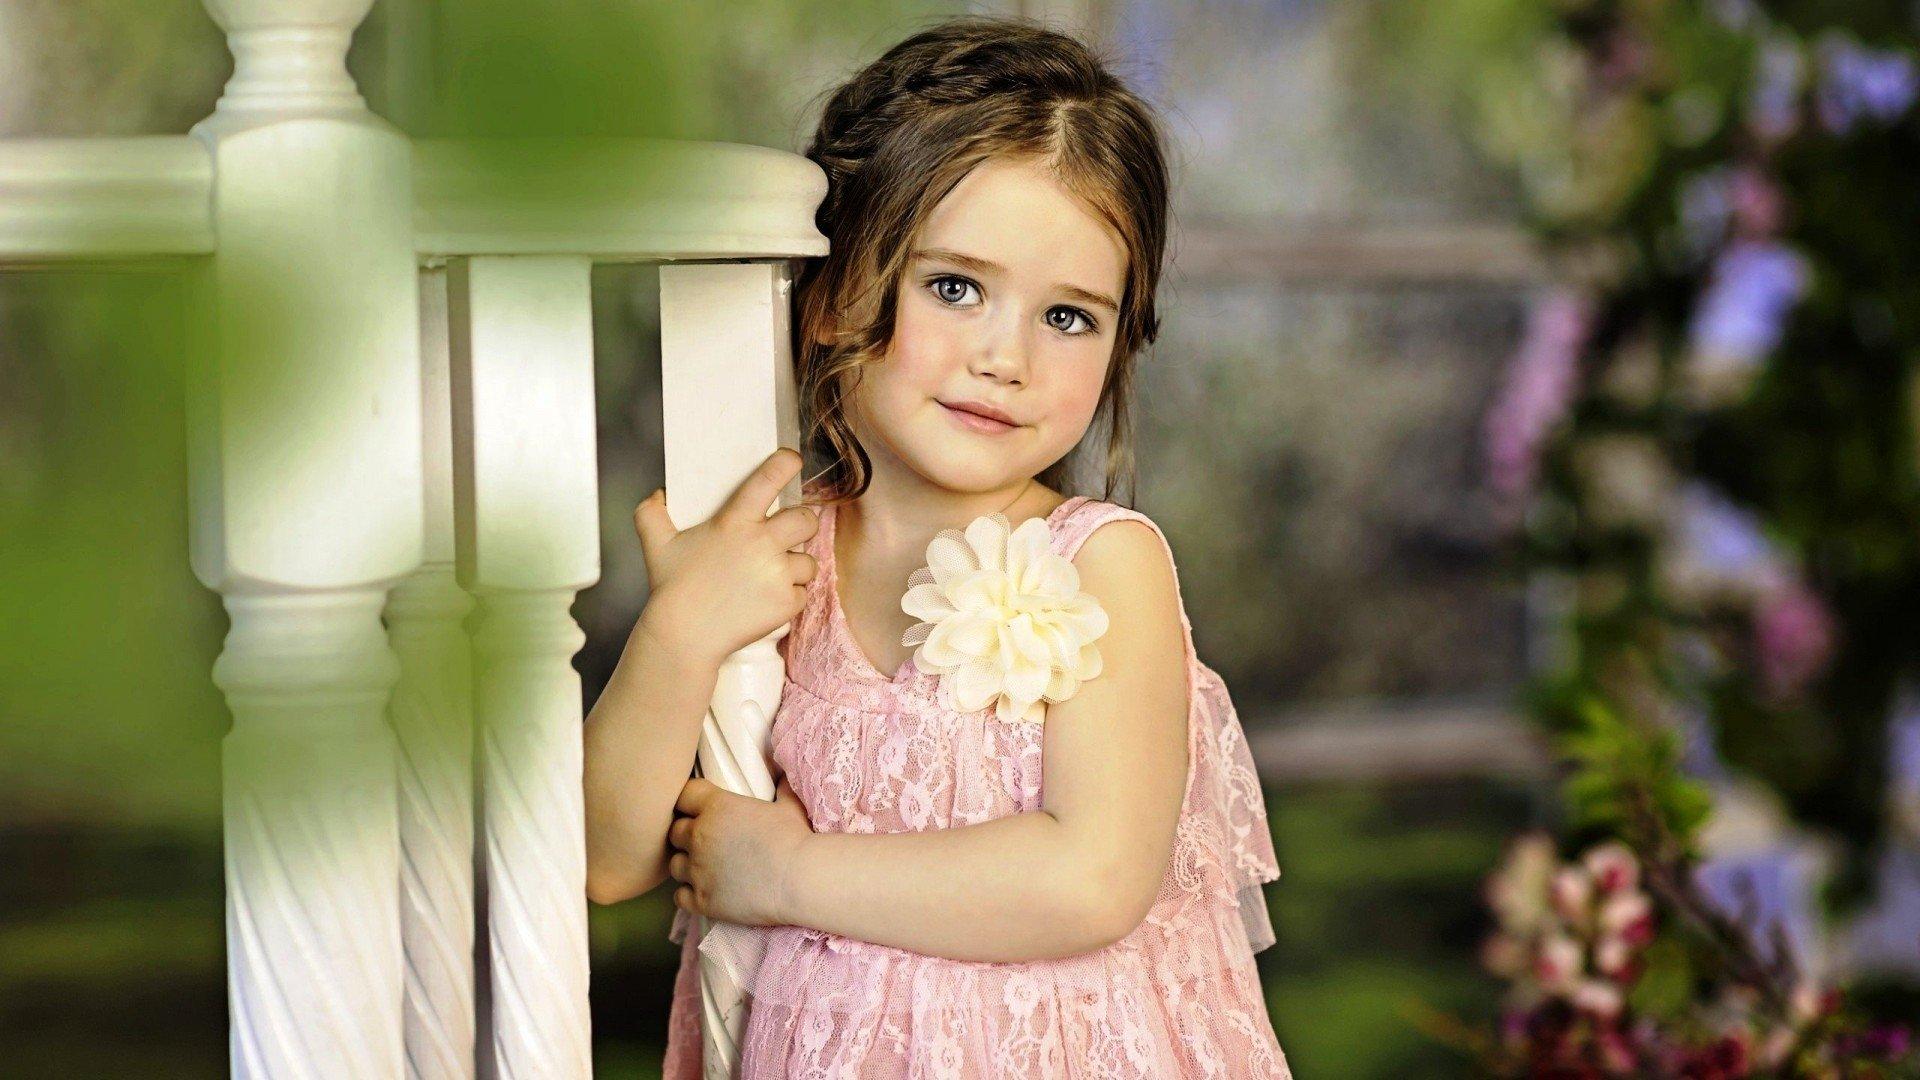 Adorable Little Girl HD Wallpaper ...